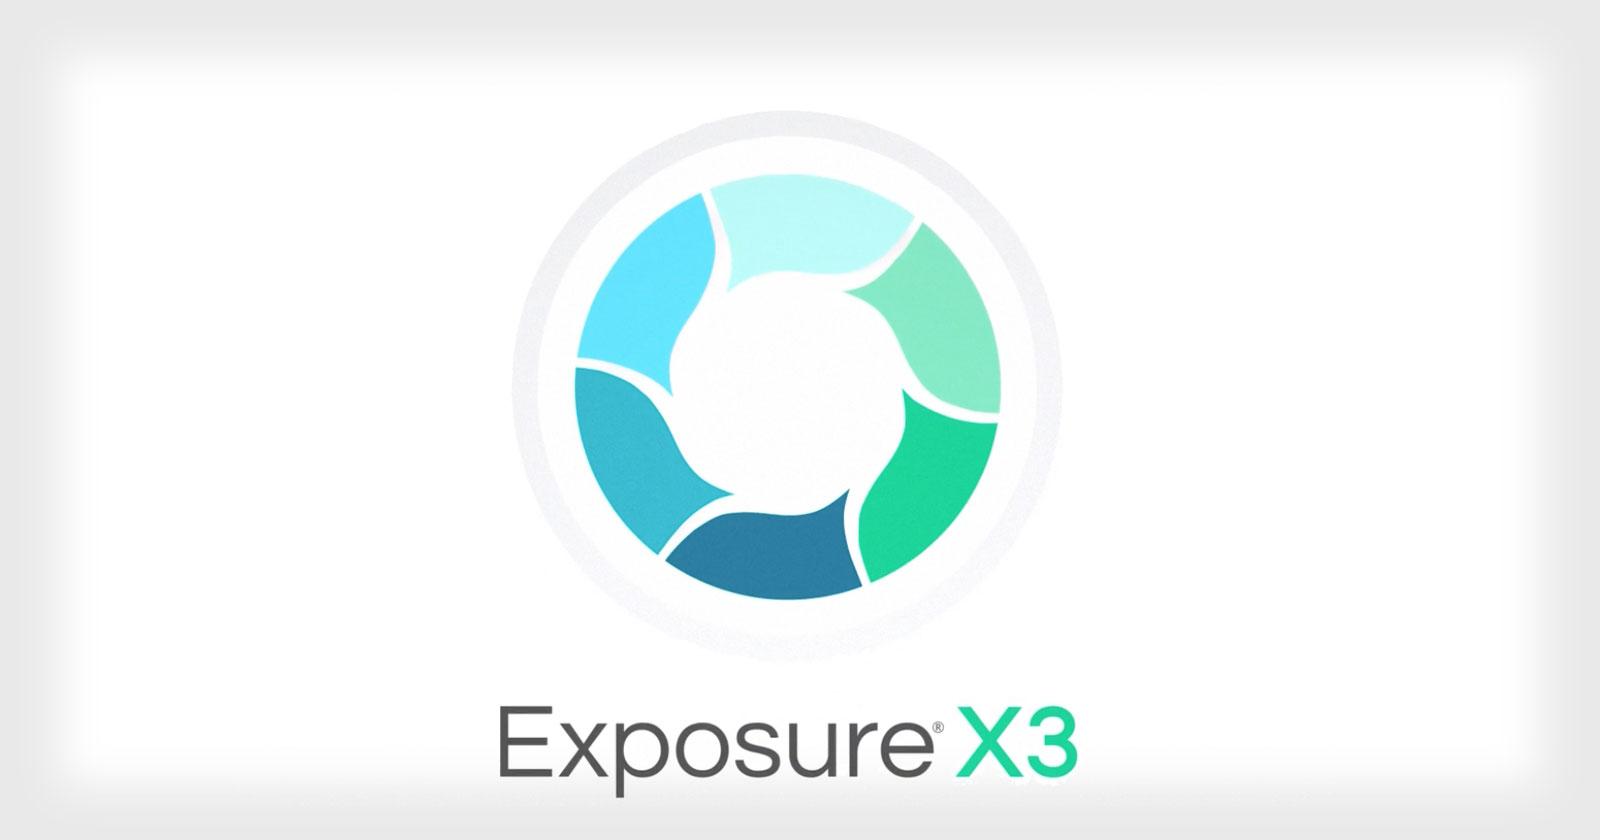 alien skin exposure x3 bundle 3.5.4.114 (x64)